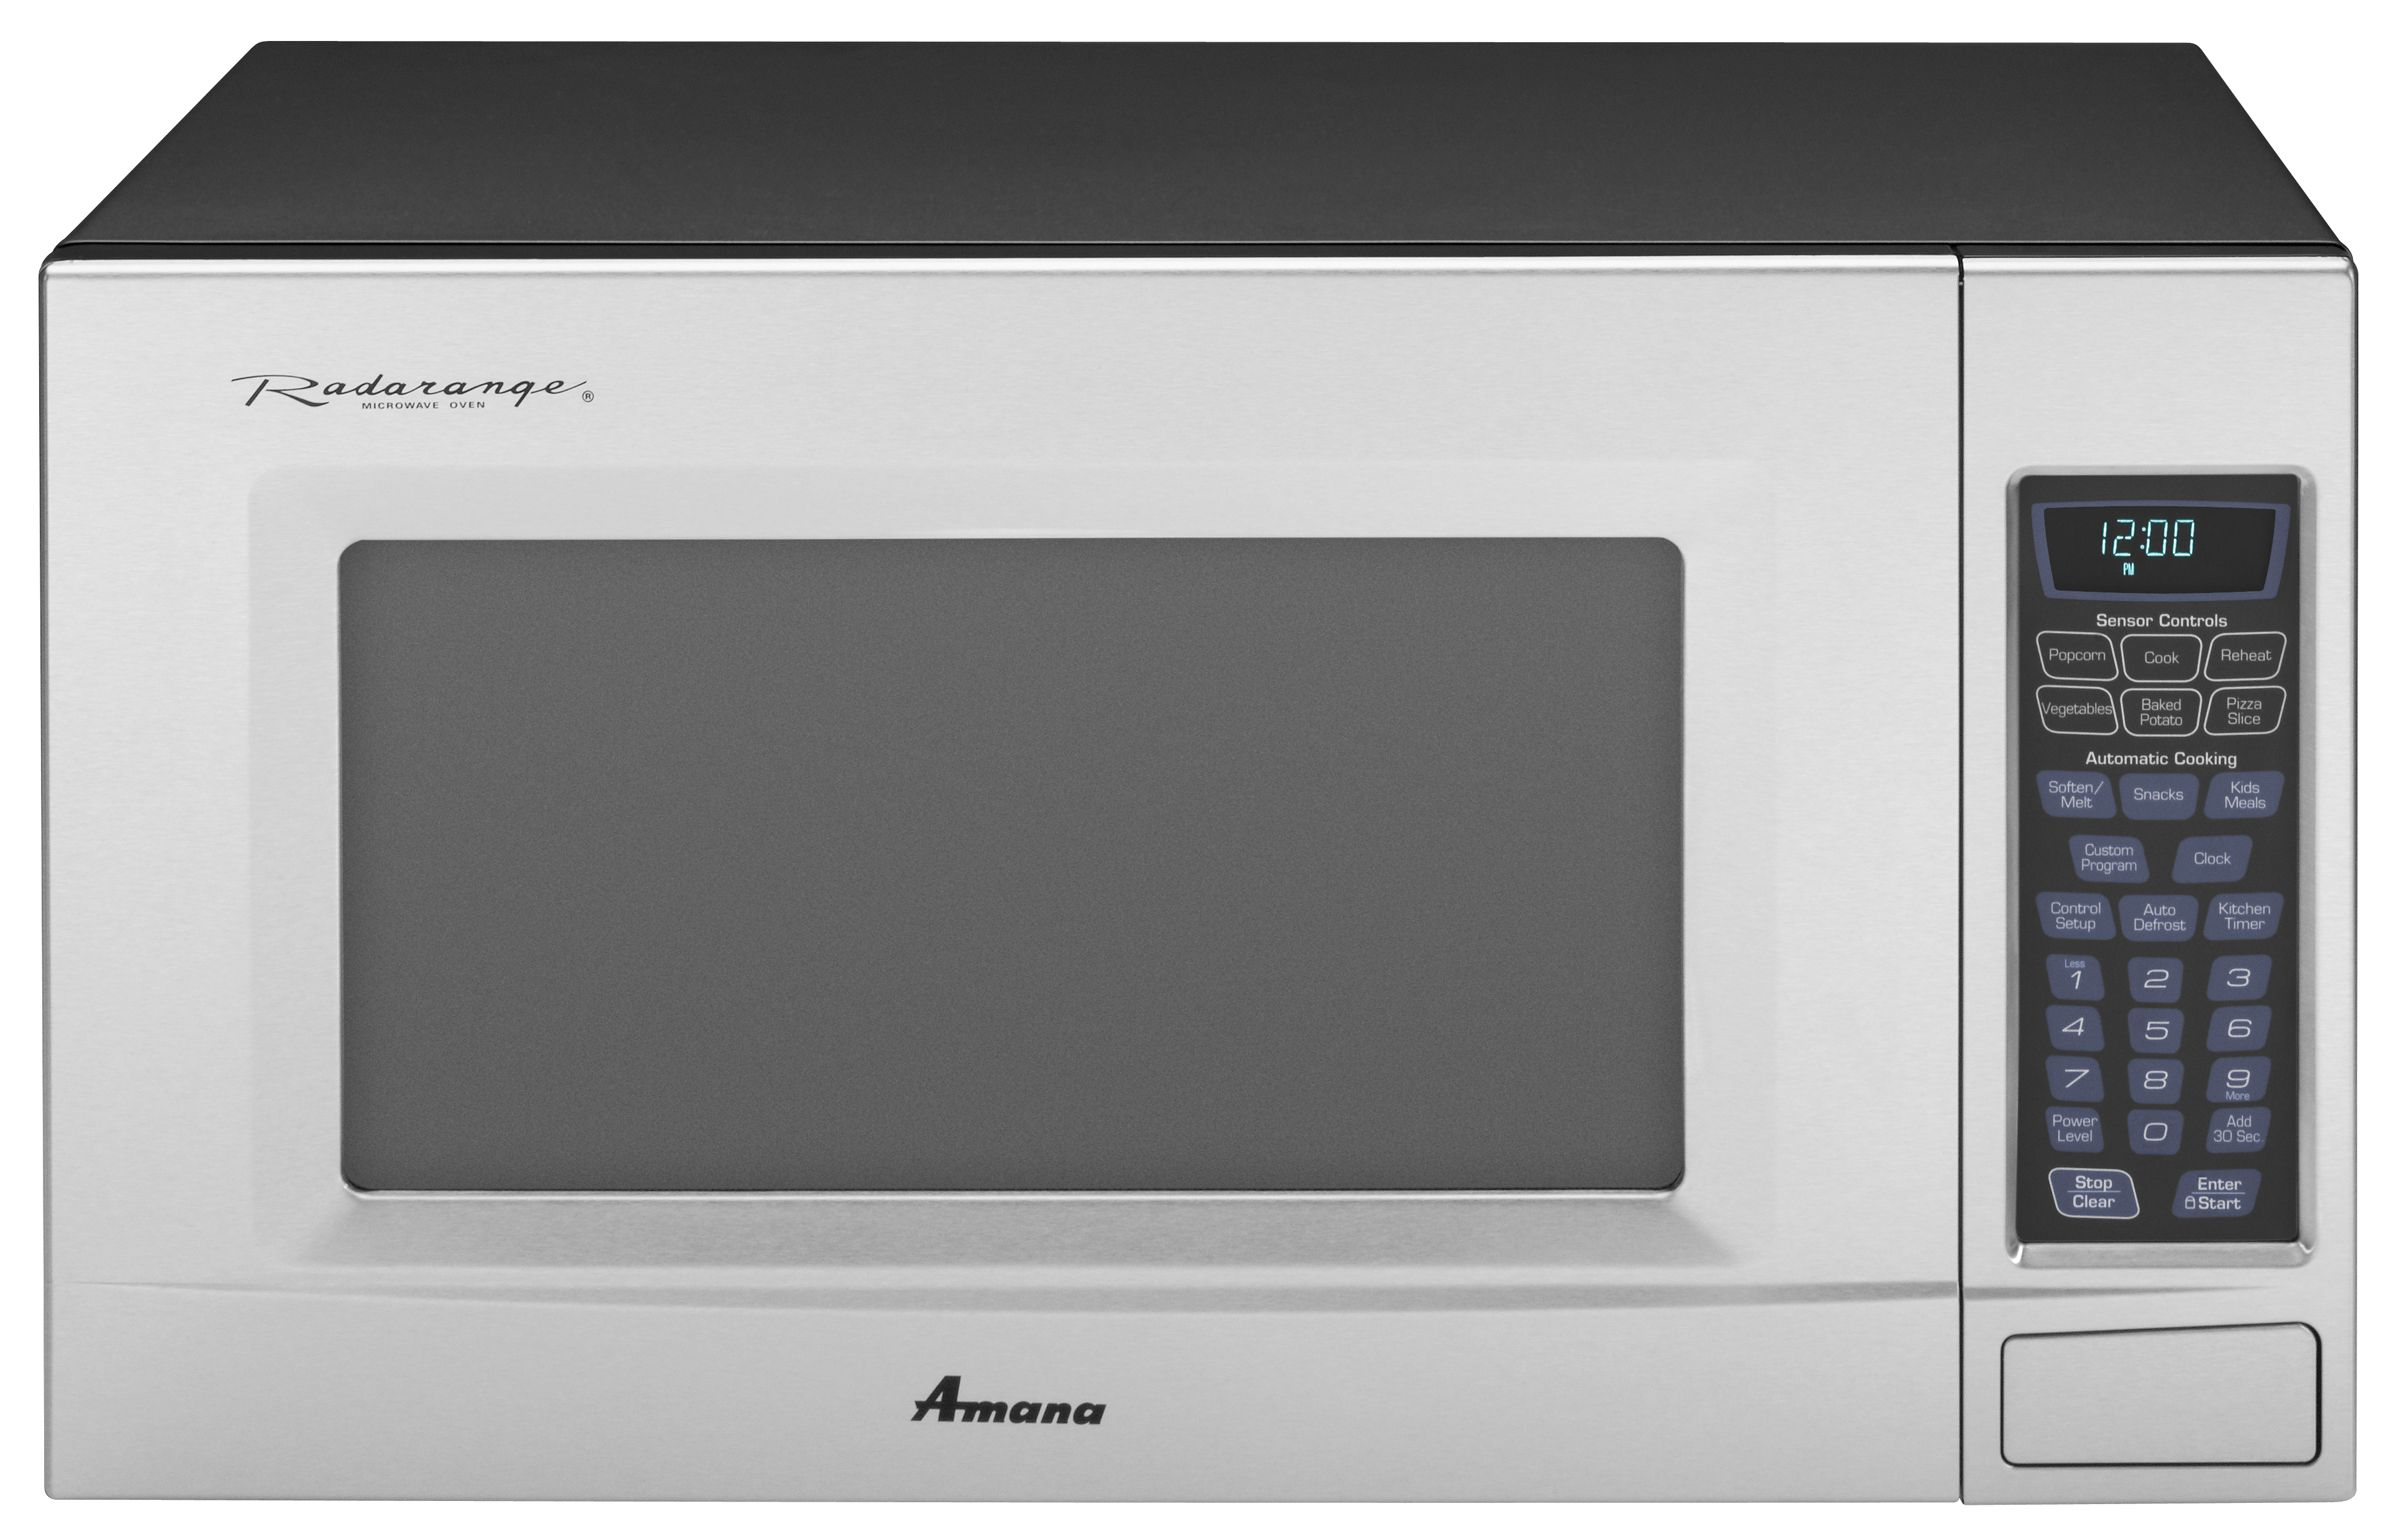 Amana Amc2206bas Radarange Reg 23 2 0 Cu Ft Microwave Oven Stainless Steel